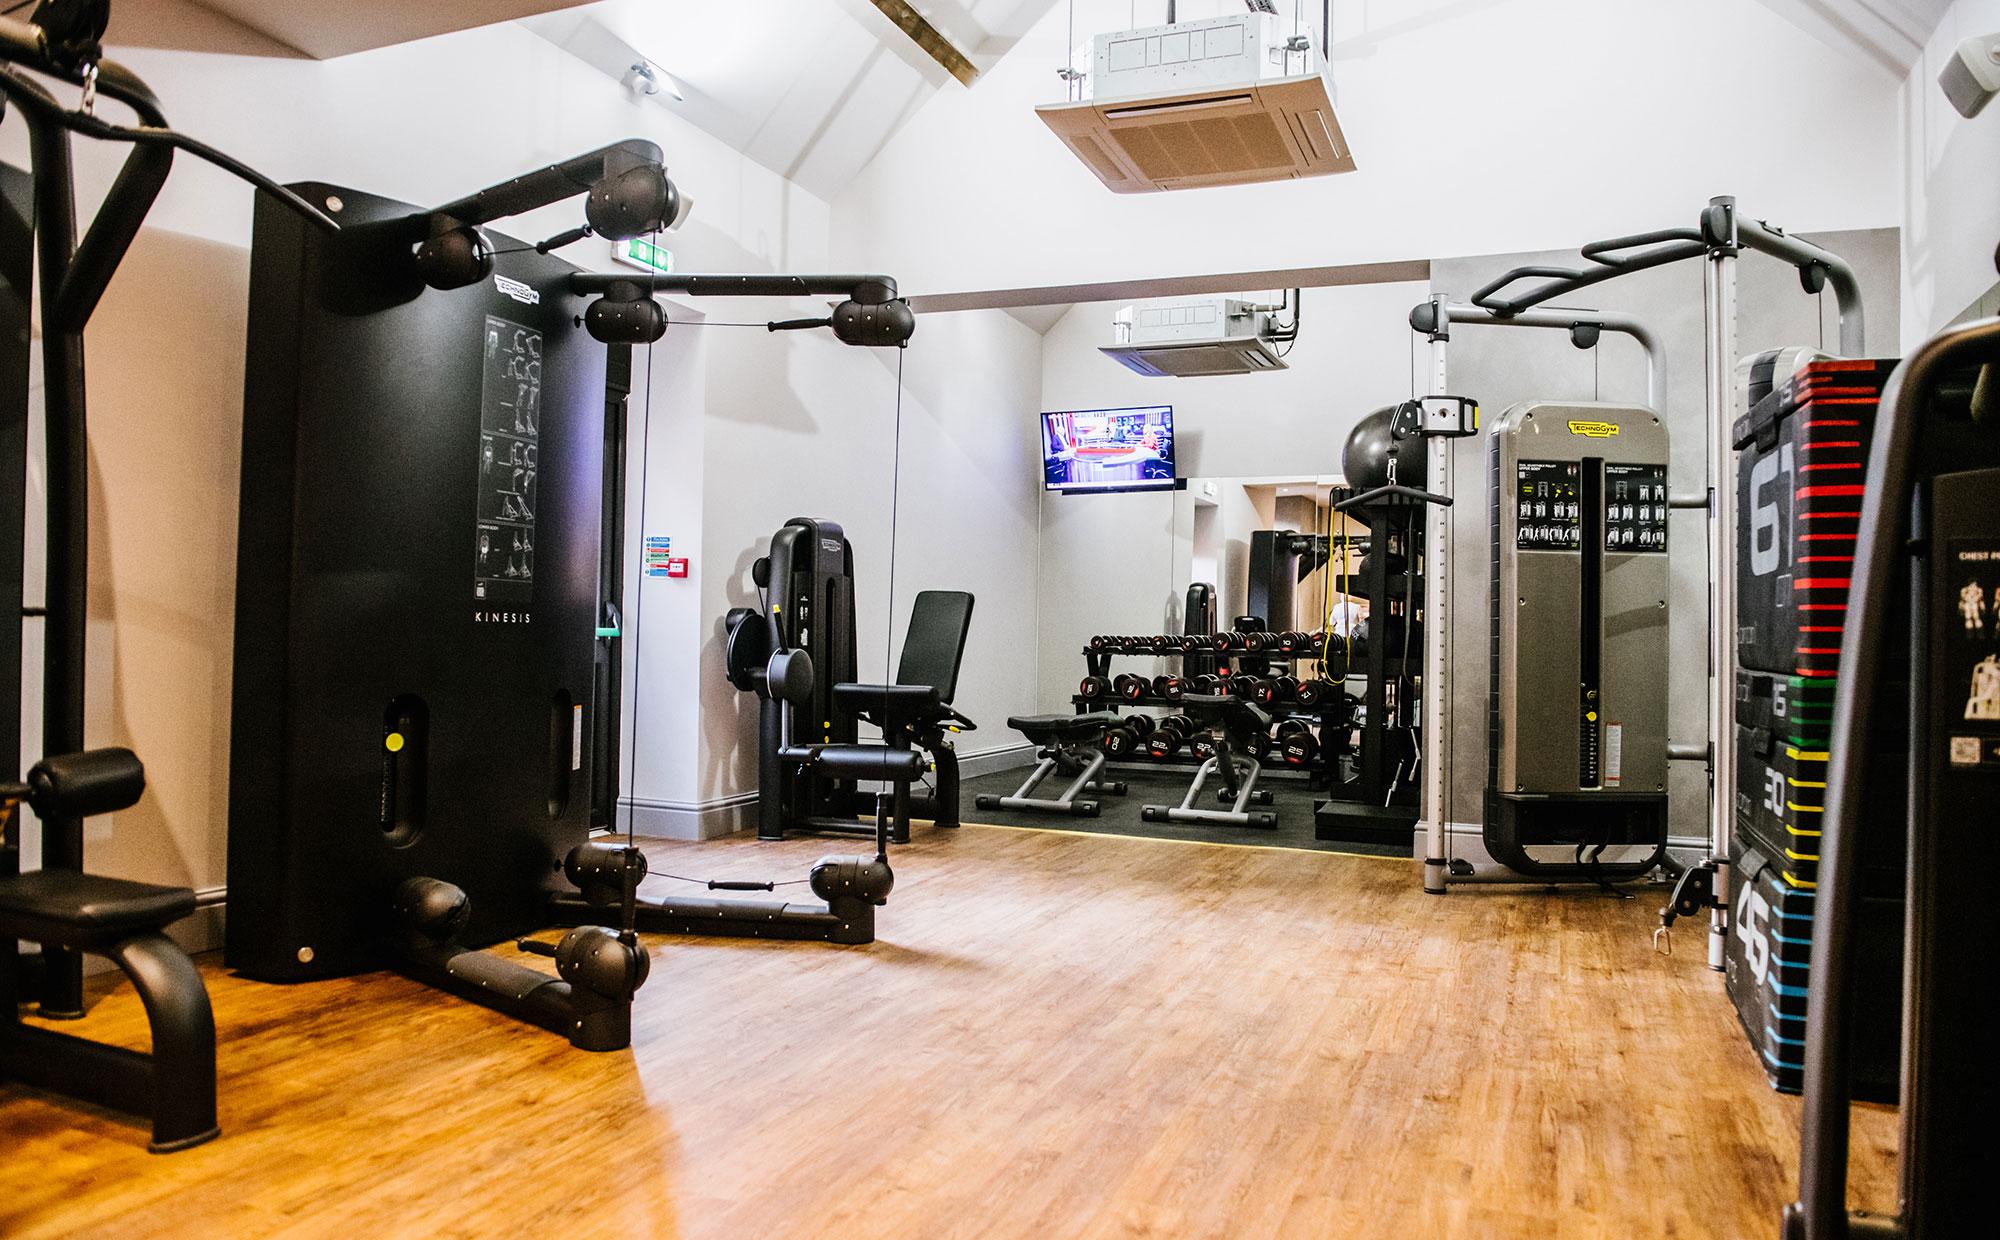 Gym Lytham St Annes